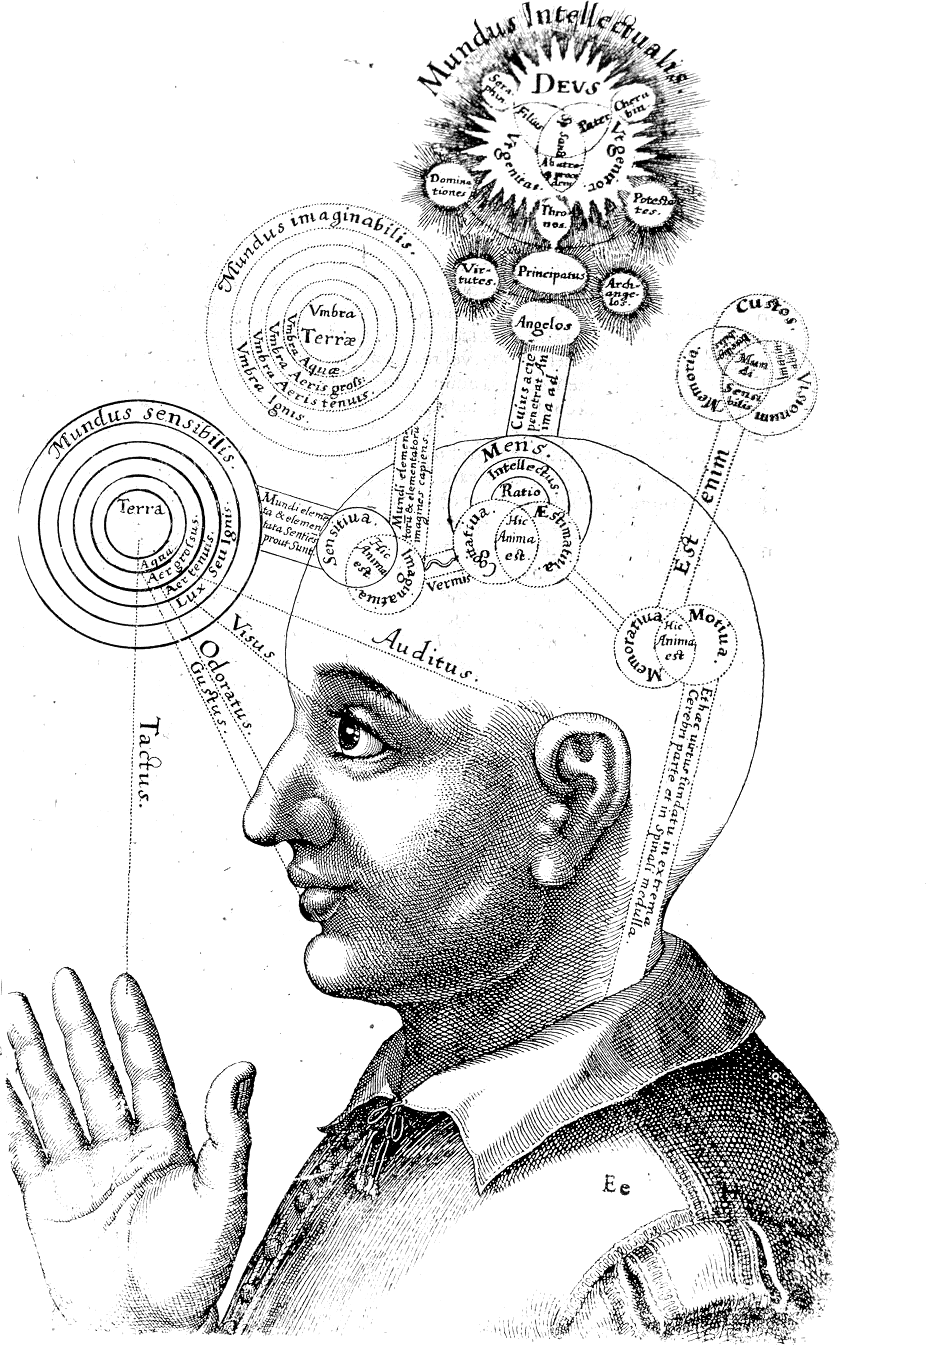 https://upload.wikimedia.org/wikipedia/commons/0/0c/RobertFuddBewusstsein17Jh.png